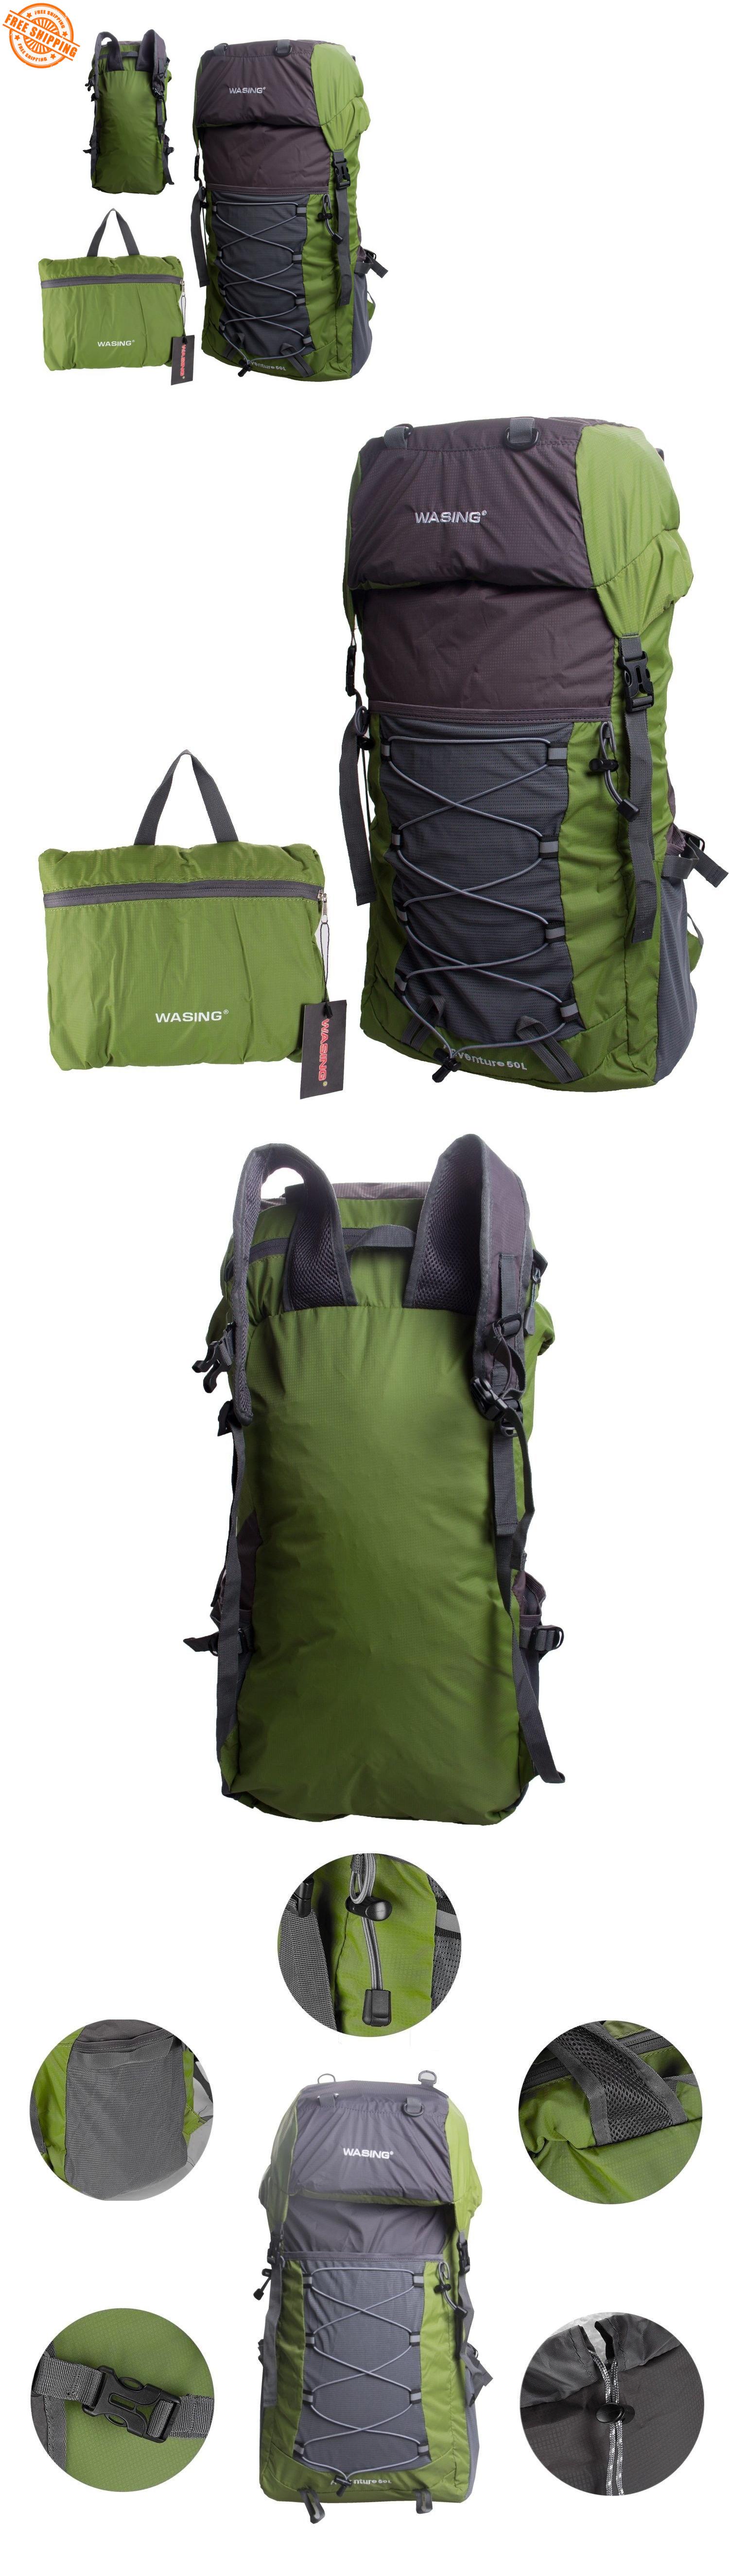 Other Camping Hiking Backpacks 36109  Waterproof Outdoor Sport Day Hiking  Trek Camping Travel Backpack Rucksack d81c70666b